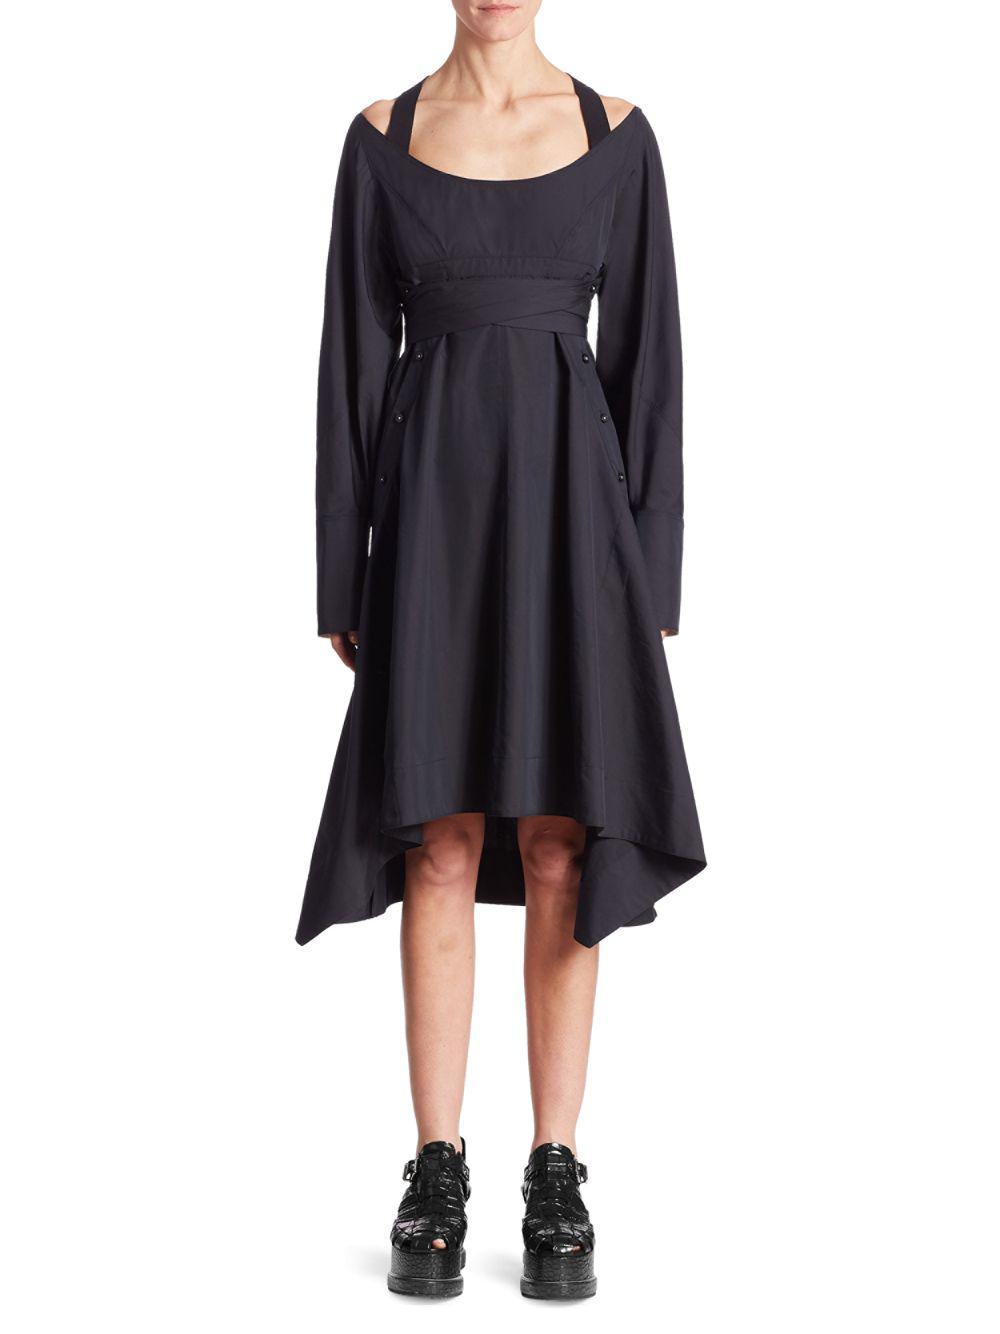 Proenza Schouler Woman Tie-back Layered Crepe Mini Dress Black Size 0 Proenza Schouler p6dBPcT